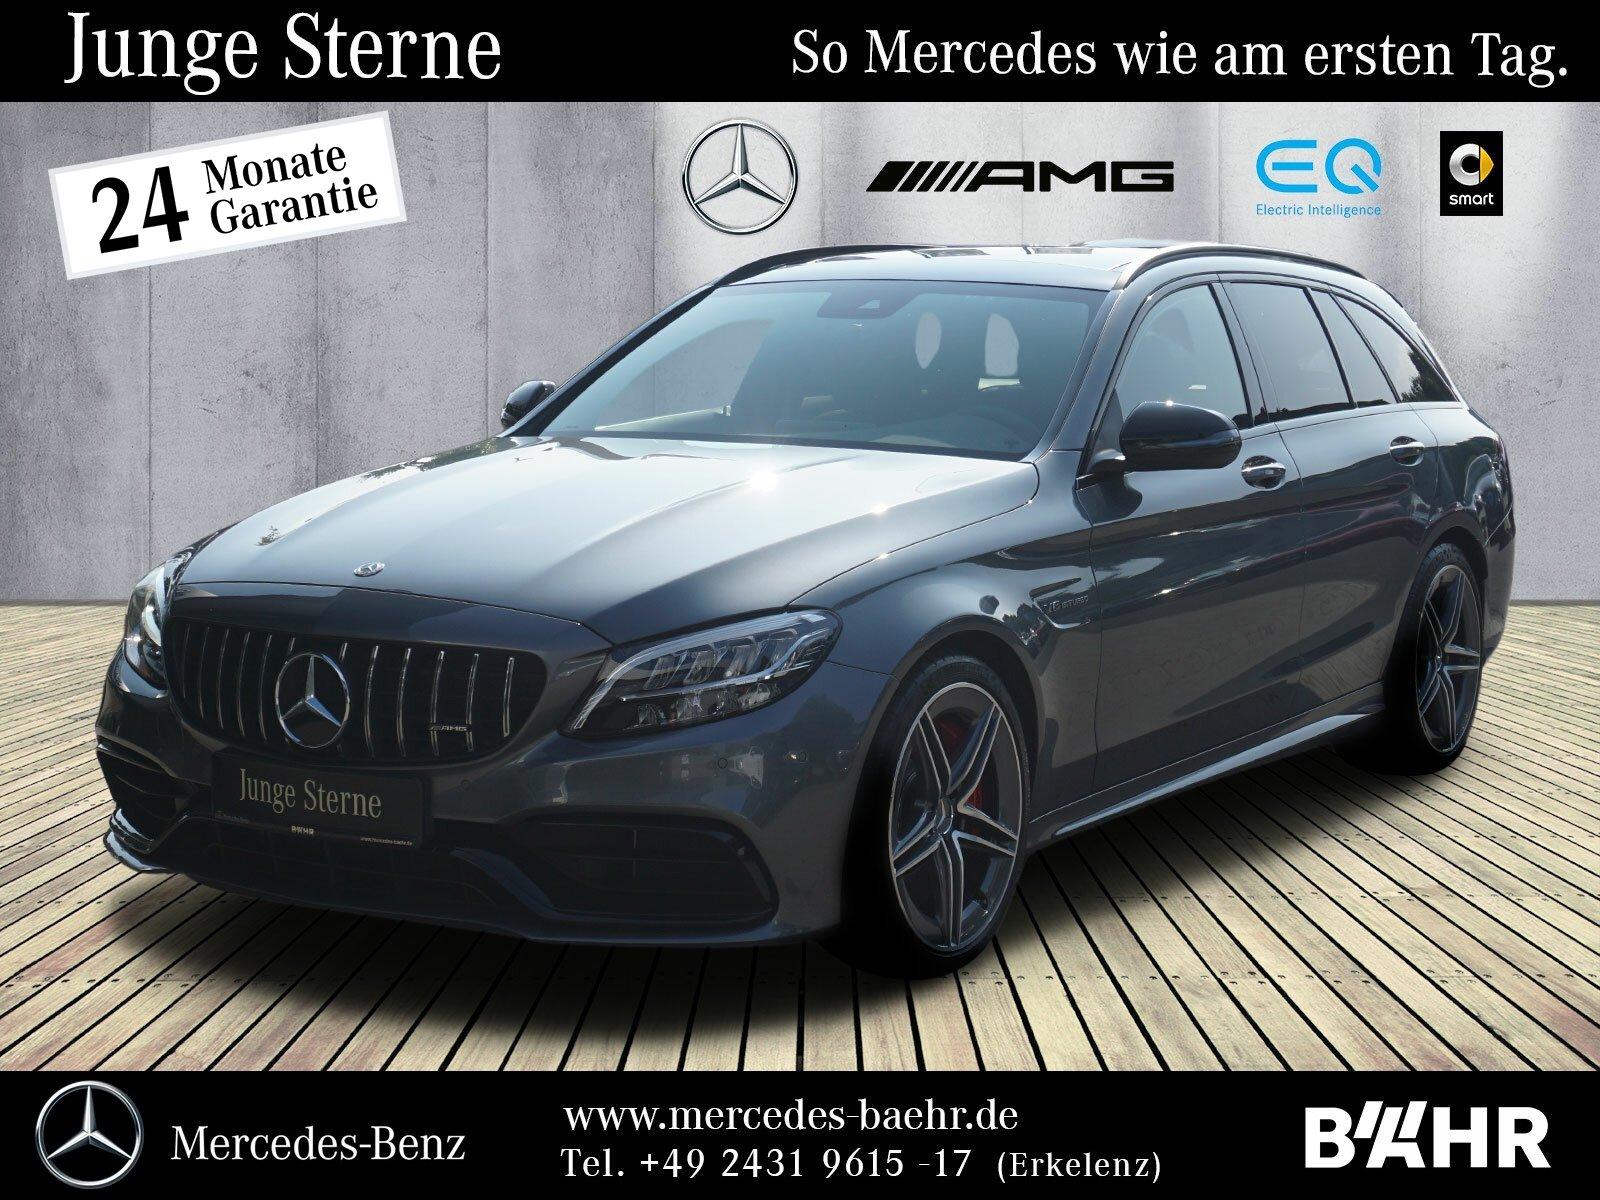 Mercedes-Benz C 63 S T Navi/LED/Pano/Driver'sPackage/Burmester, Jahr 2019, Benzin